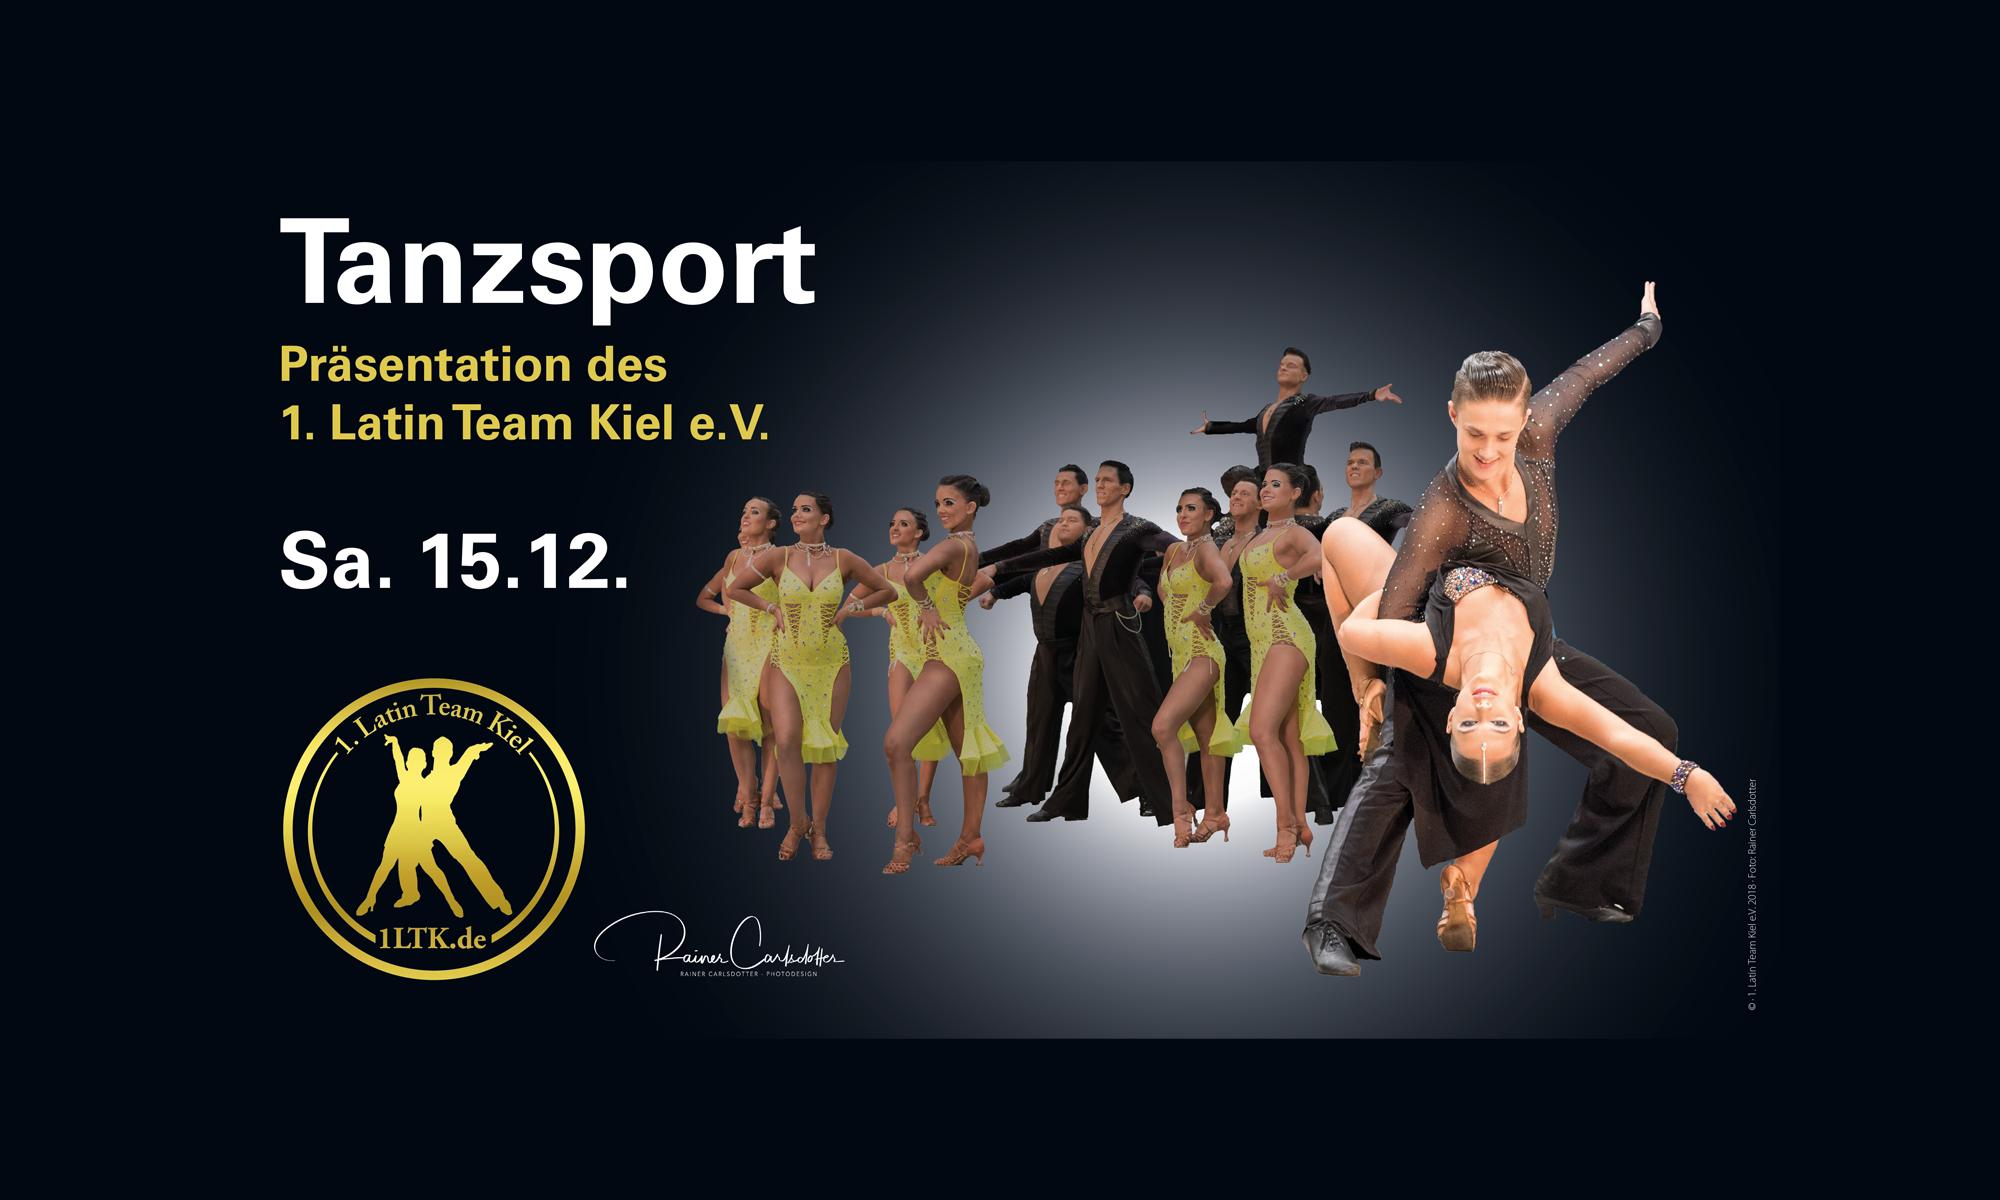 1. Latin Team Kiel e.V.